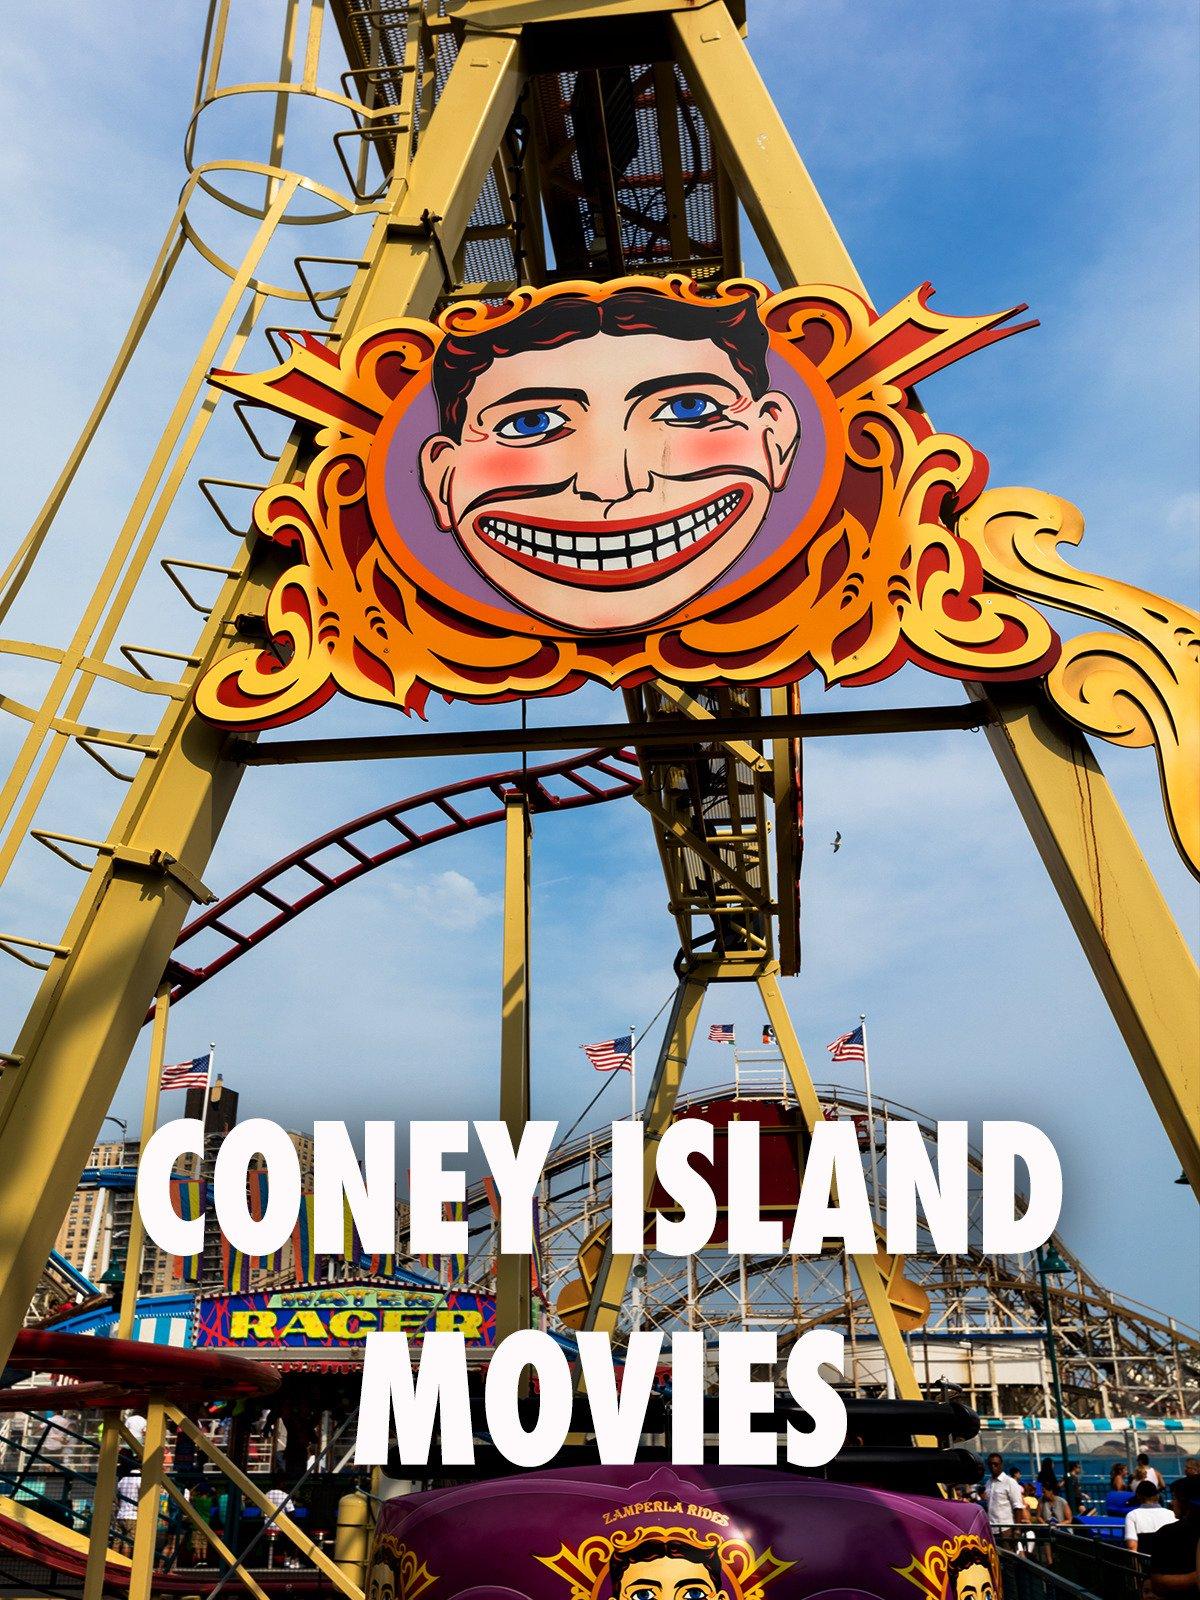 Coney Island Movies